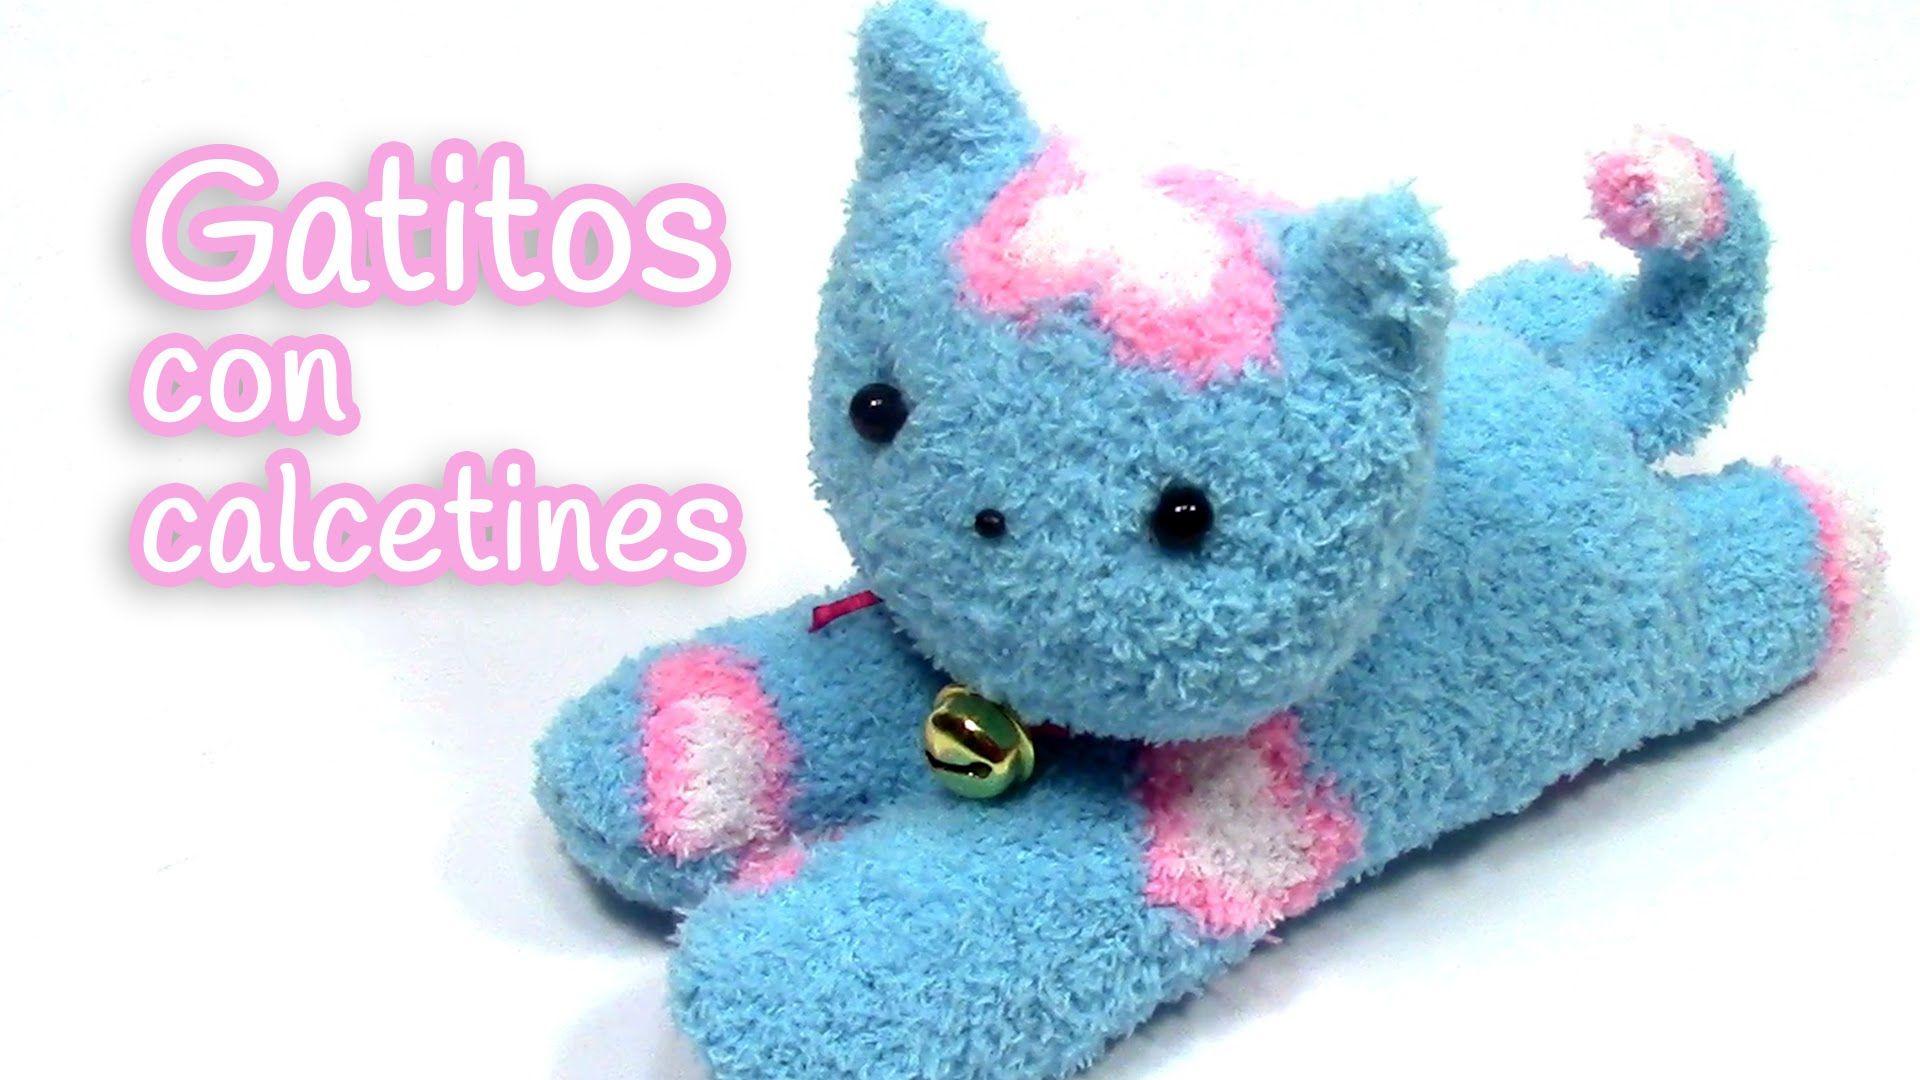 Manualidades Gatito De Peluche Hecho Con Calcetines Innova Manualidades Youtube Gatos De Peluche Manualidades Con Calcetines Munecos Con Calcetines